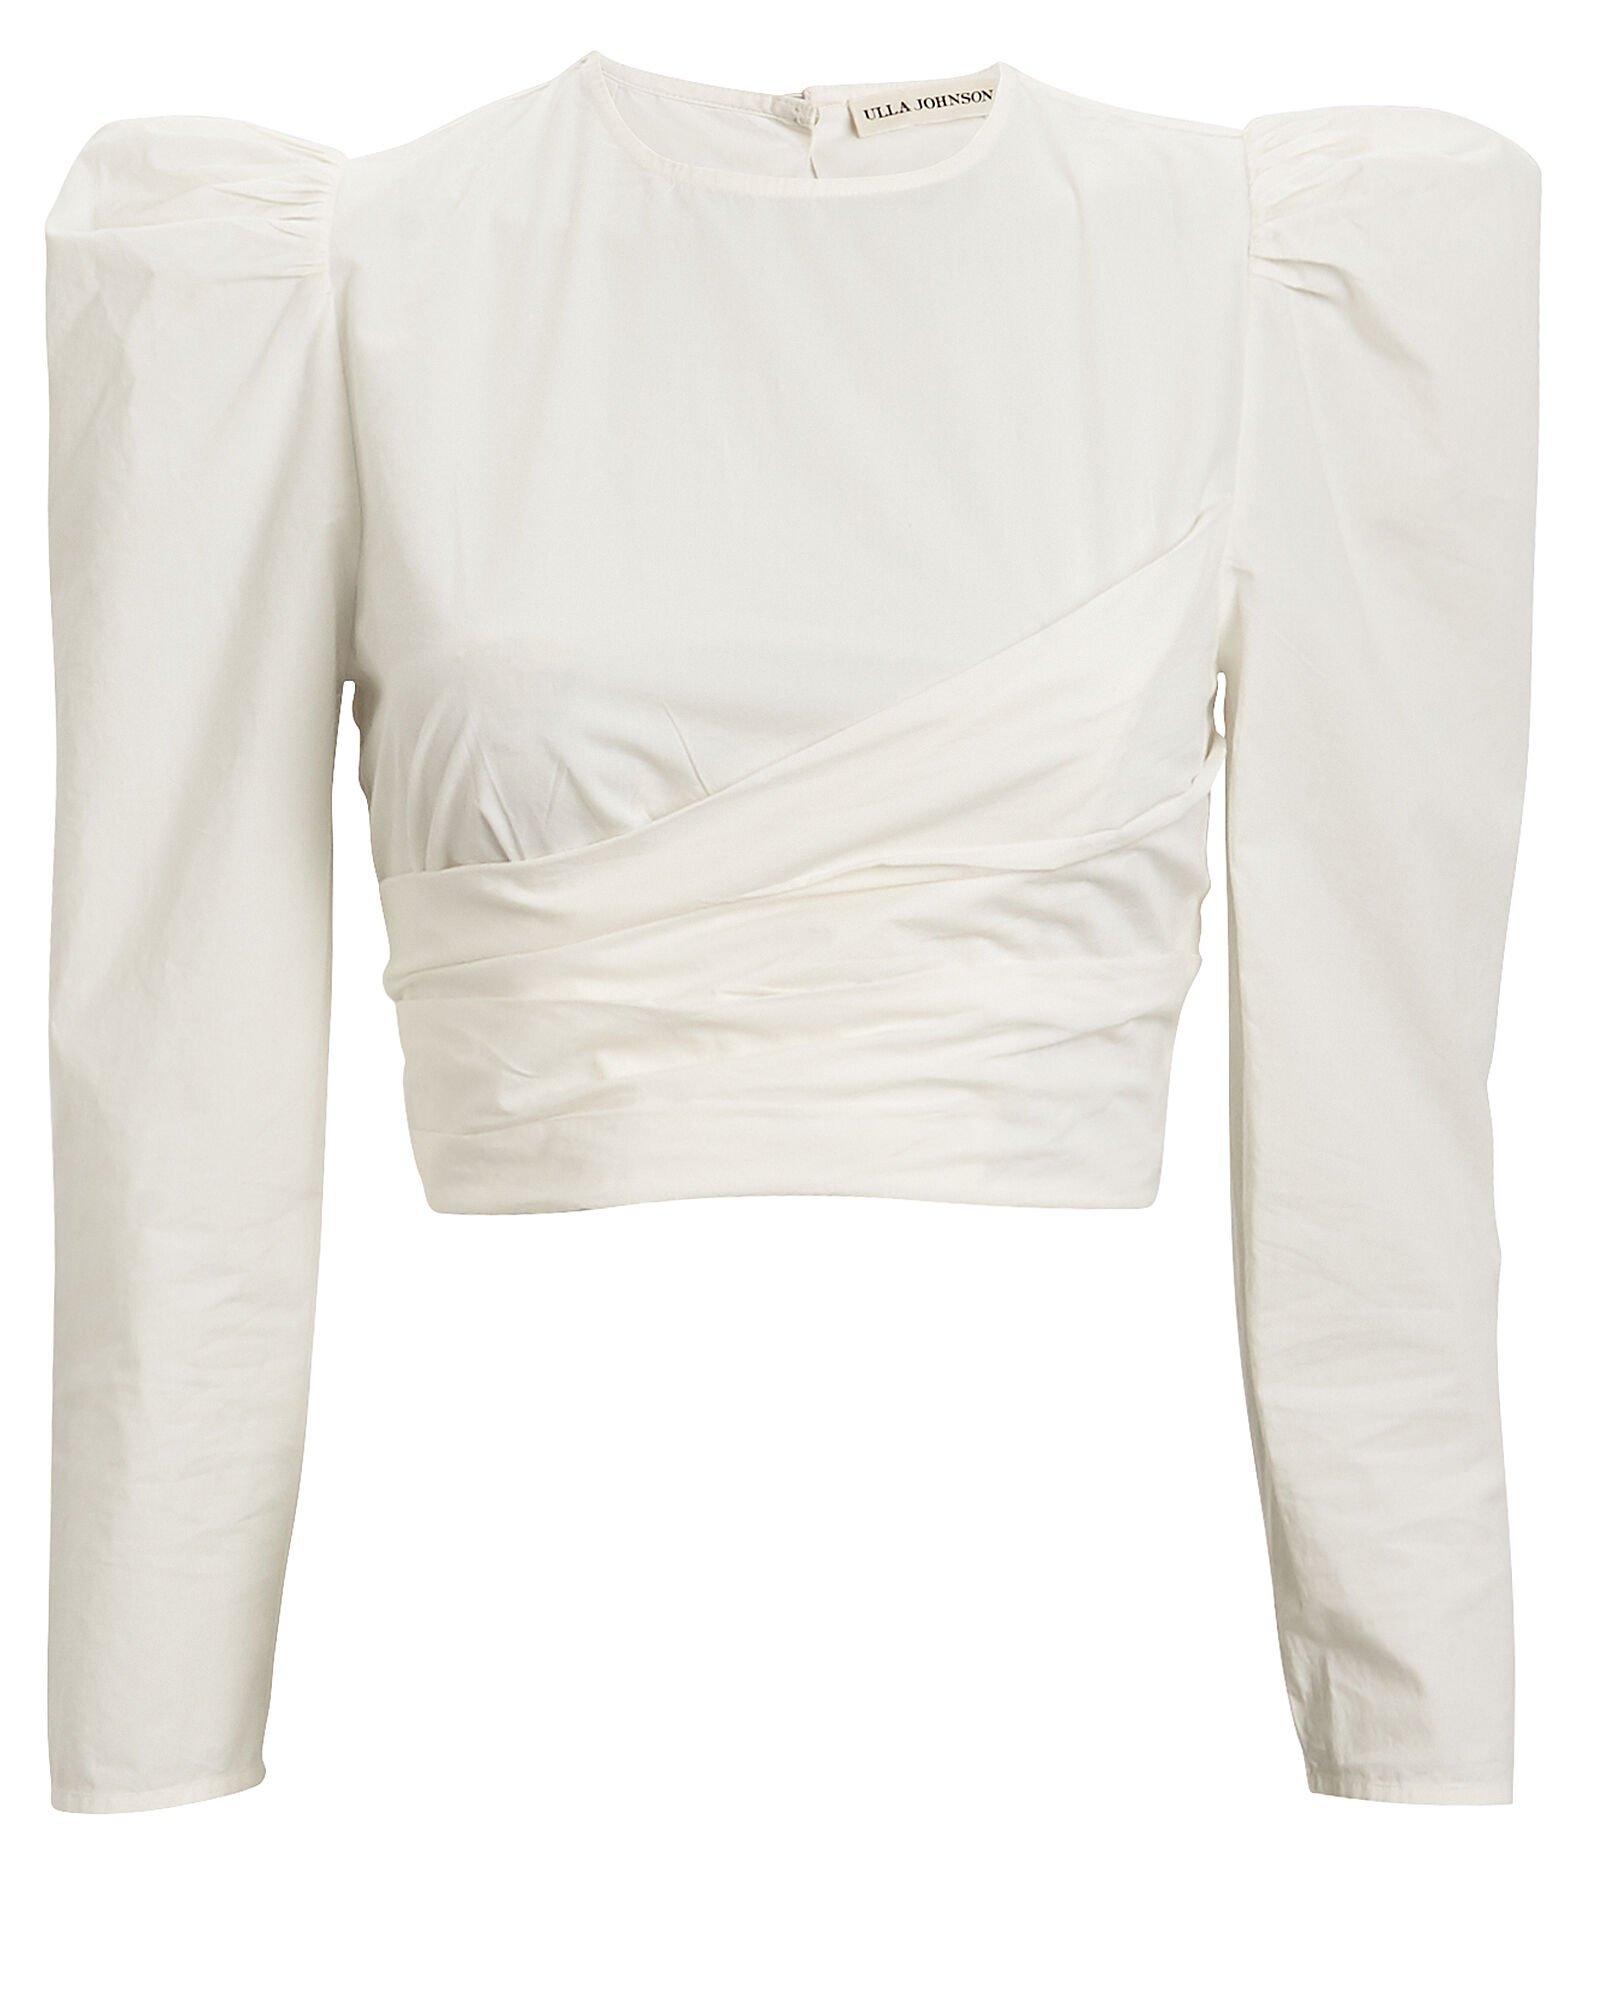 Ulla Johnson   Eden Cropped Cotton Blouse   INTERMIX®